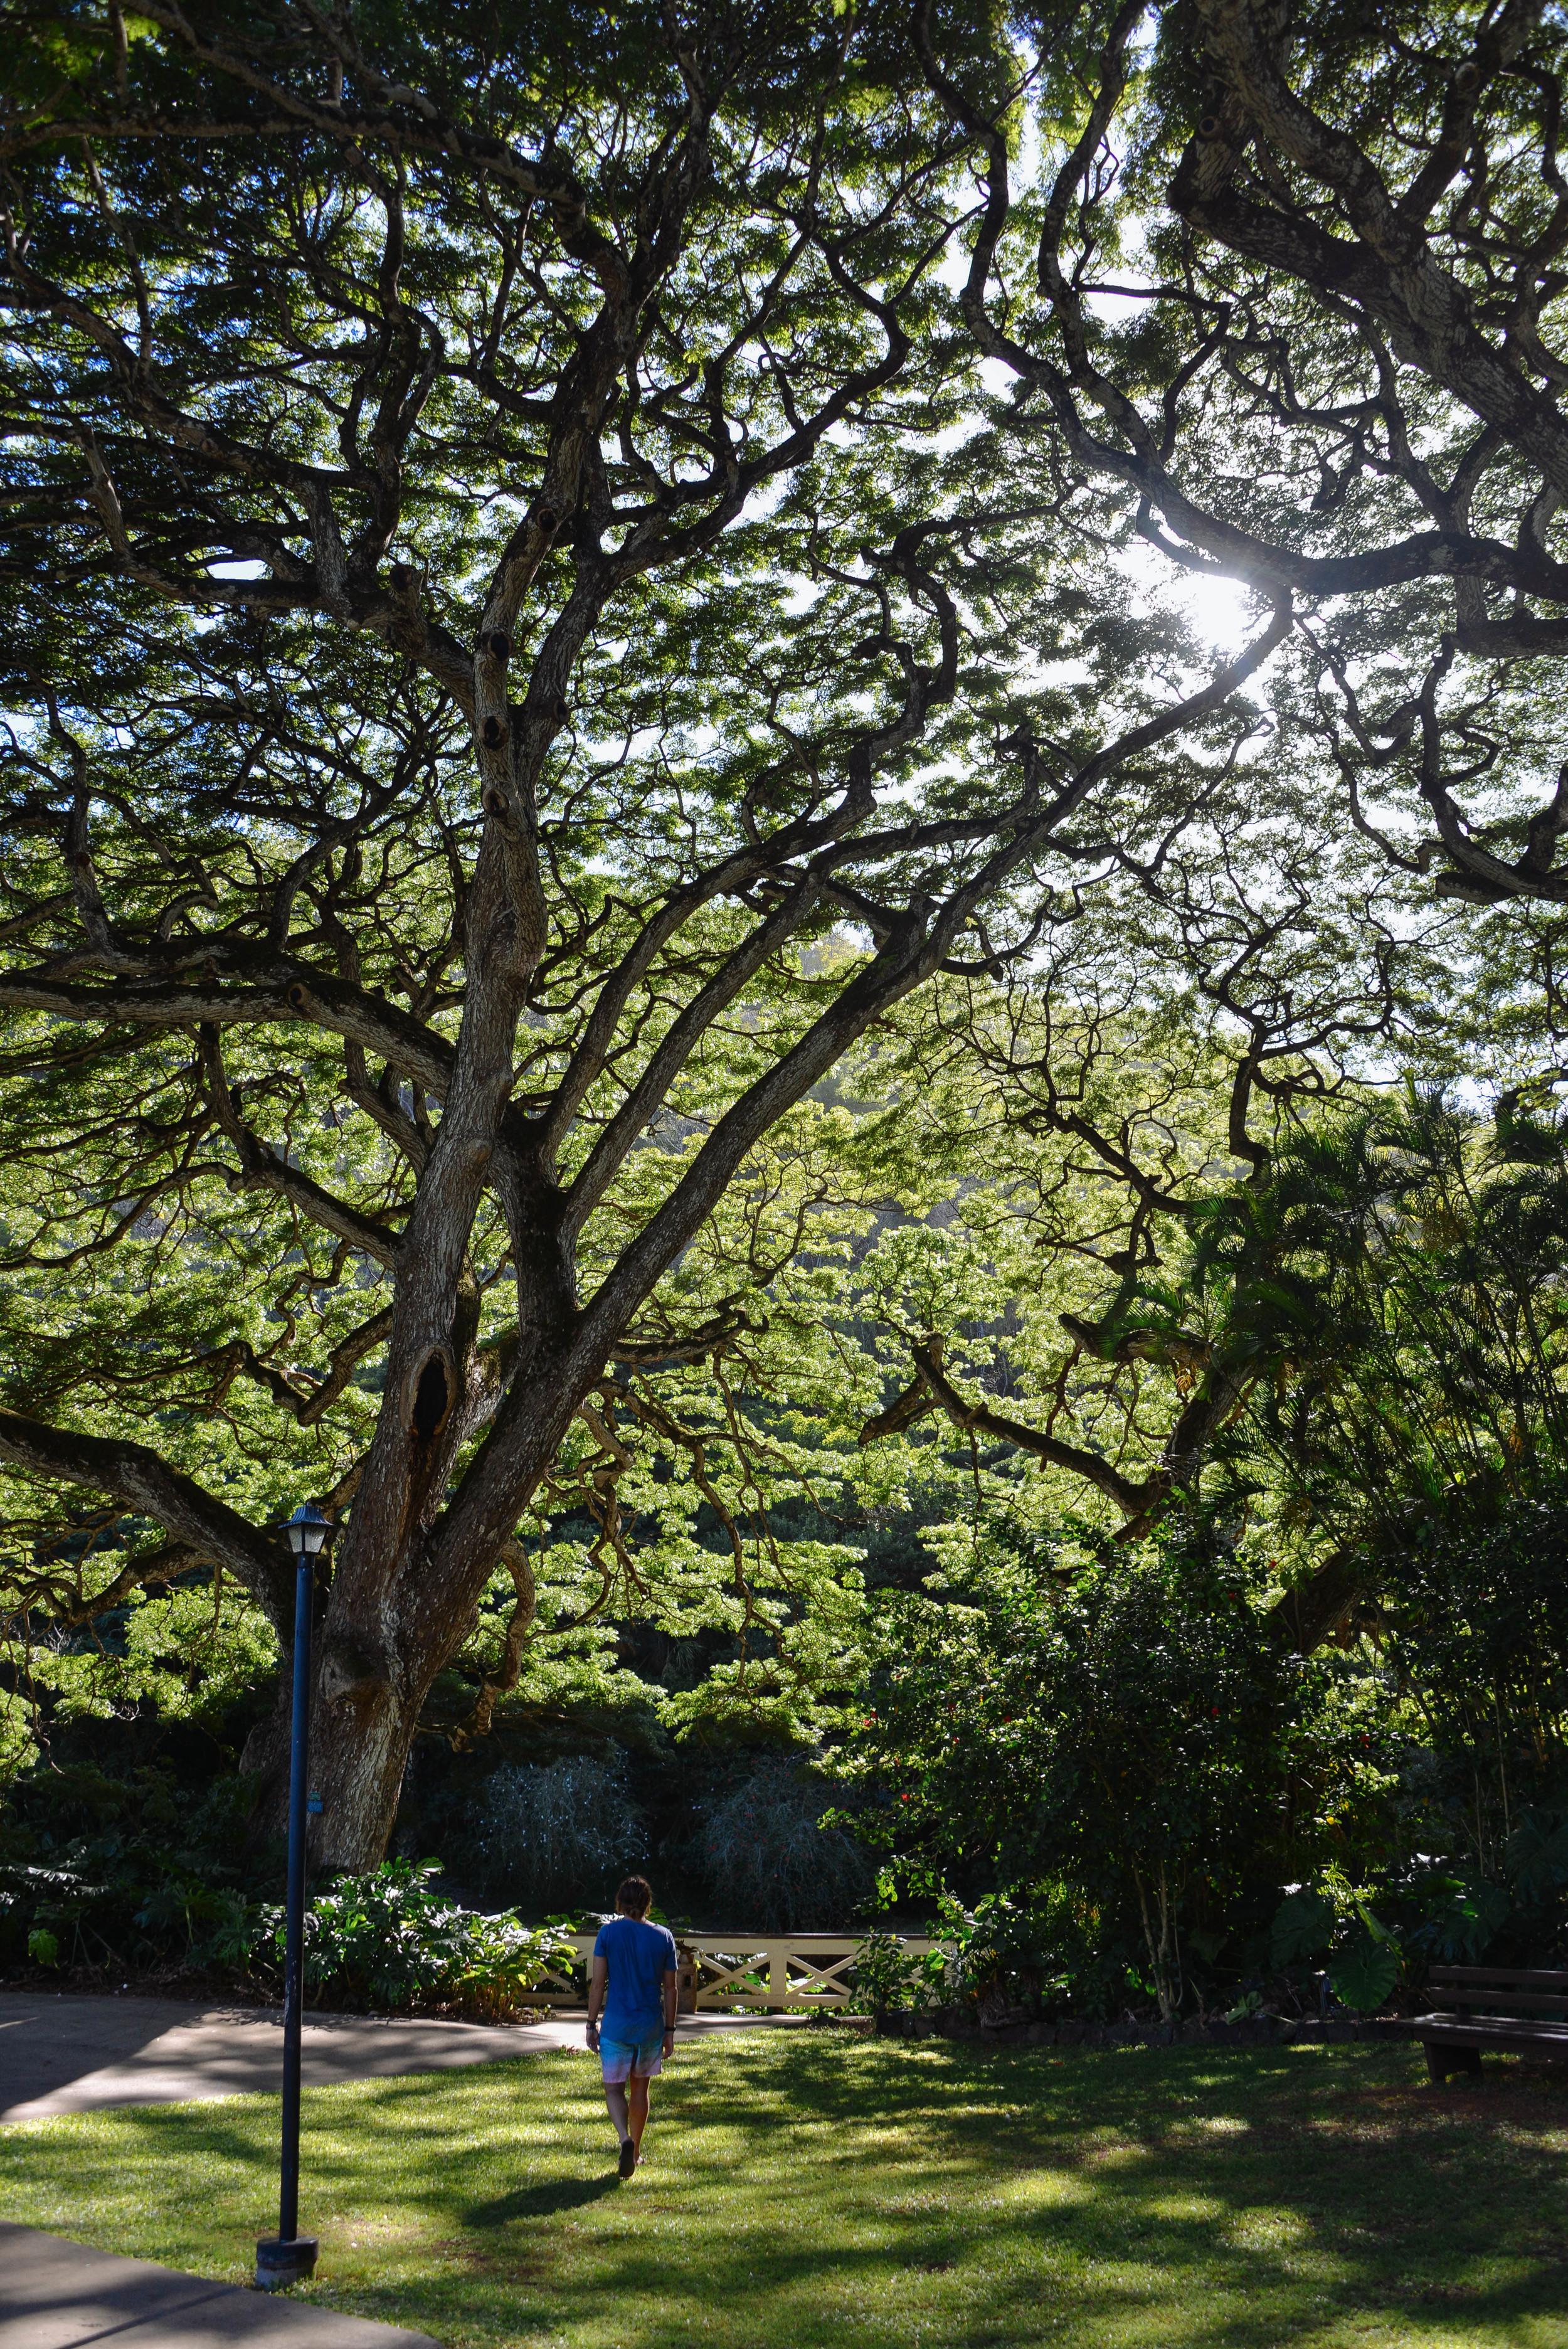 Jonny strolling through the Waimea Valley gardens on Oahu.